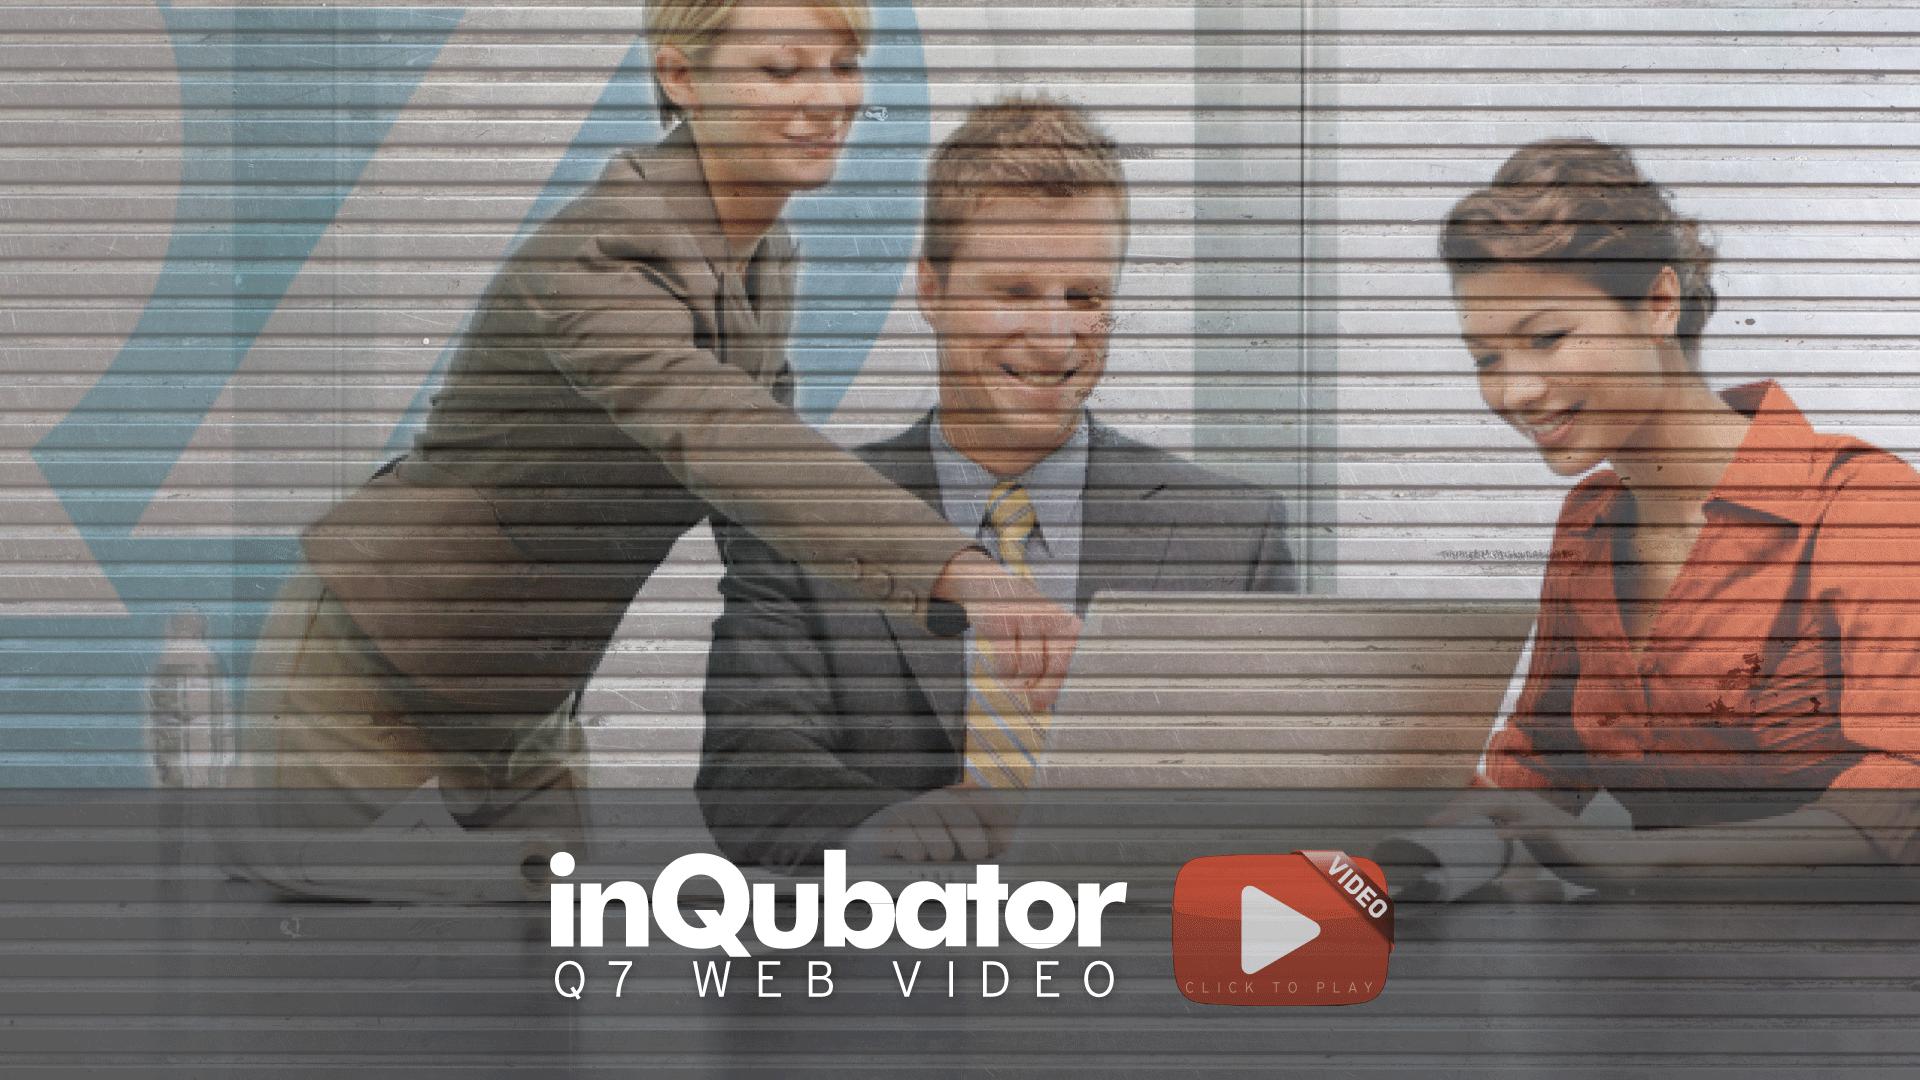 Q7webvideovideothumbnailforwordpresswebsite